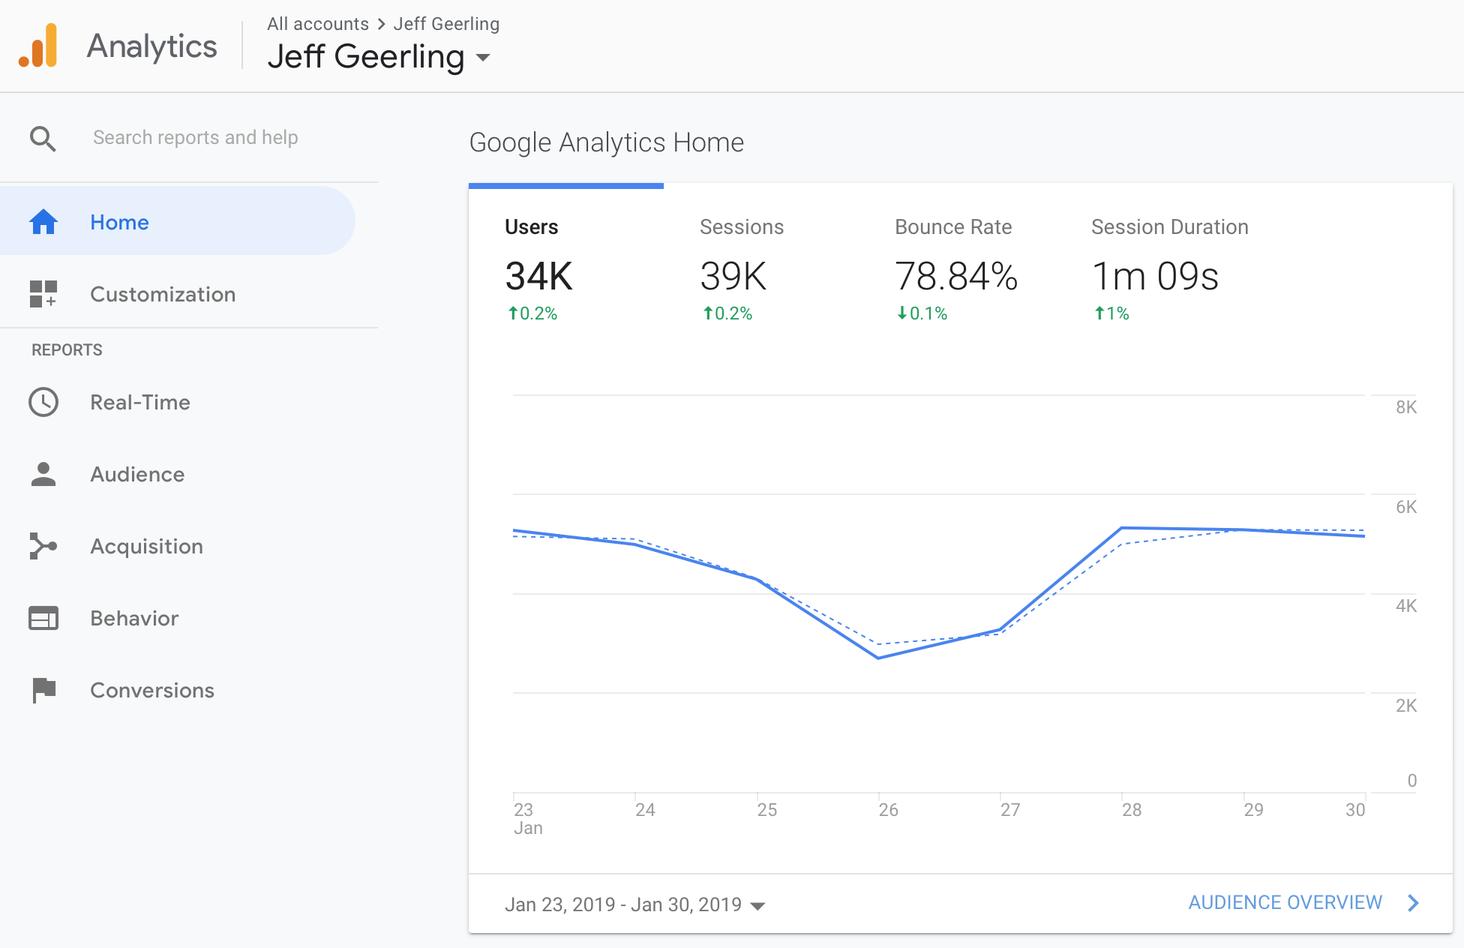 google analytics ecommerce reporting tool littledata